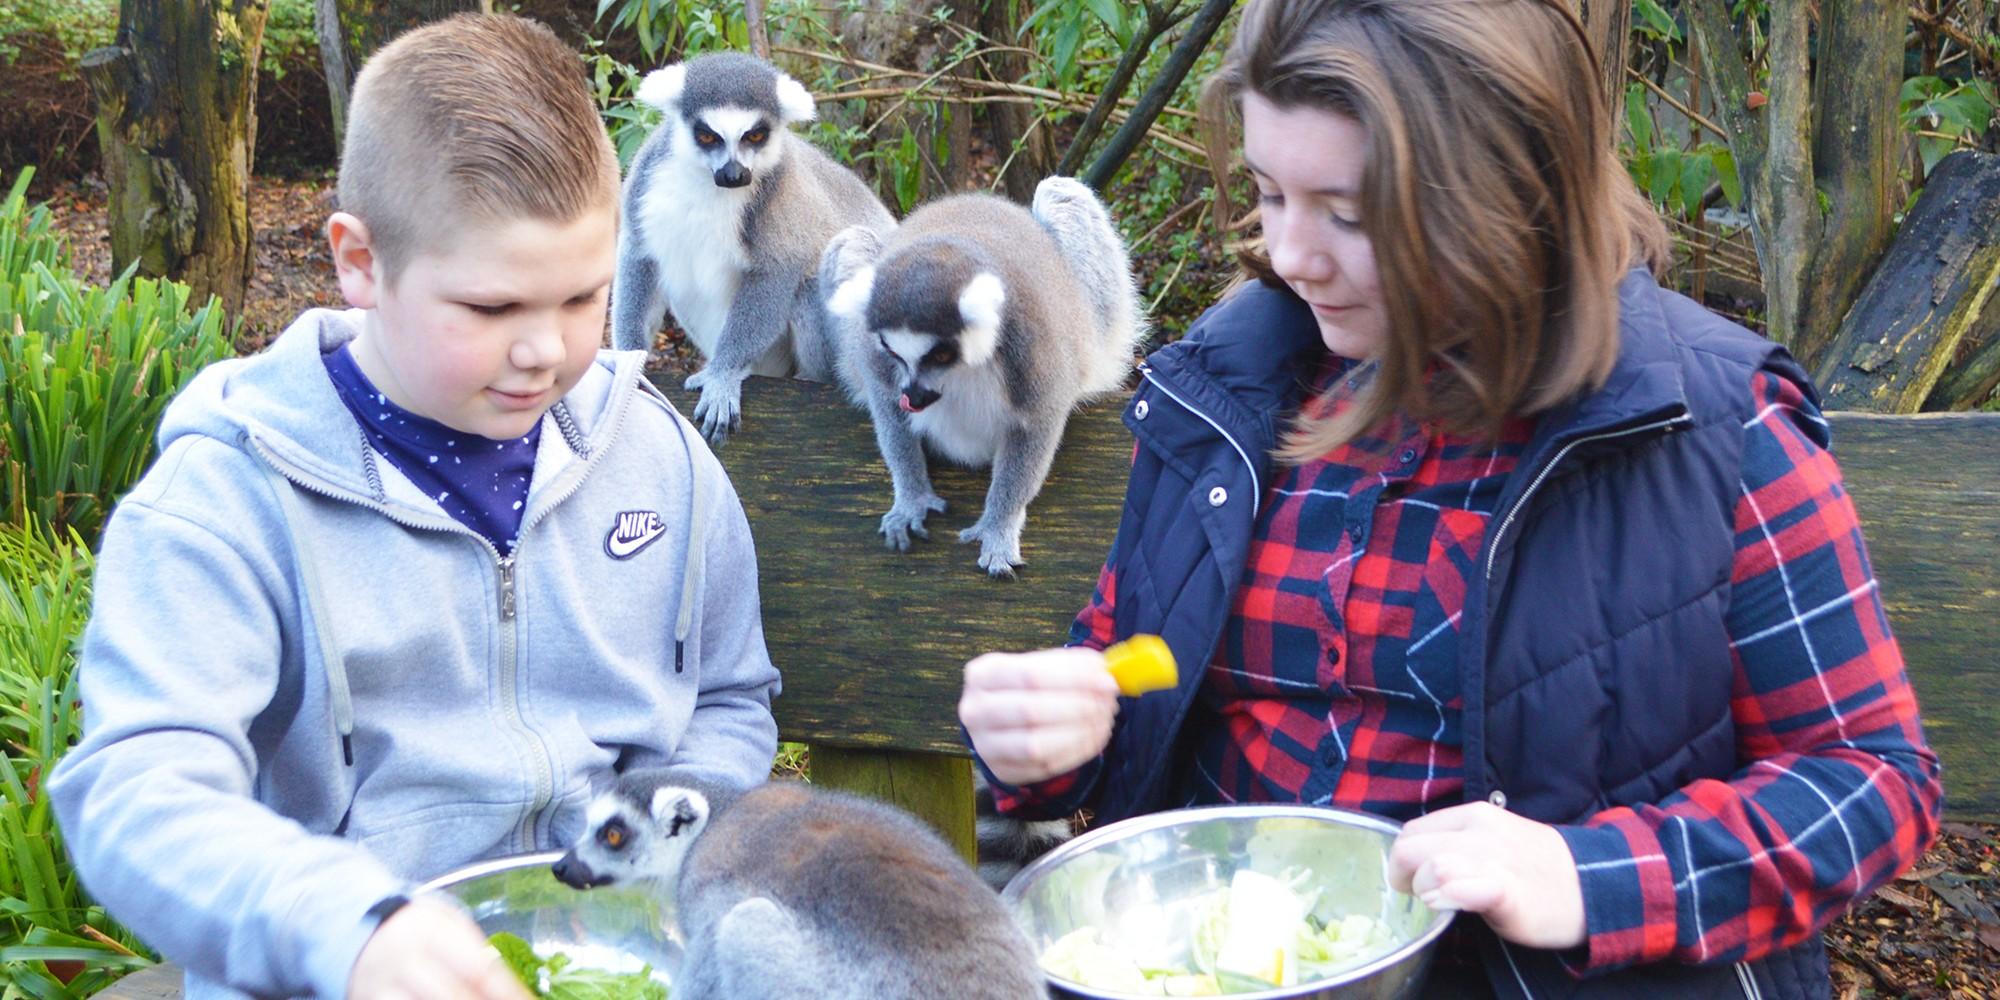 boy and girl feeding lemurs